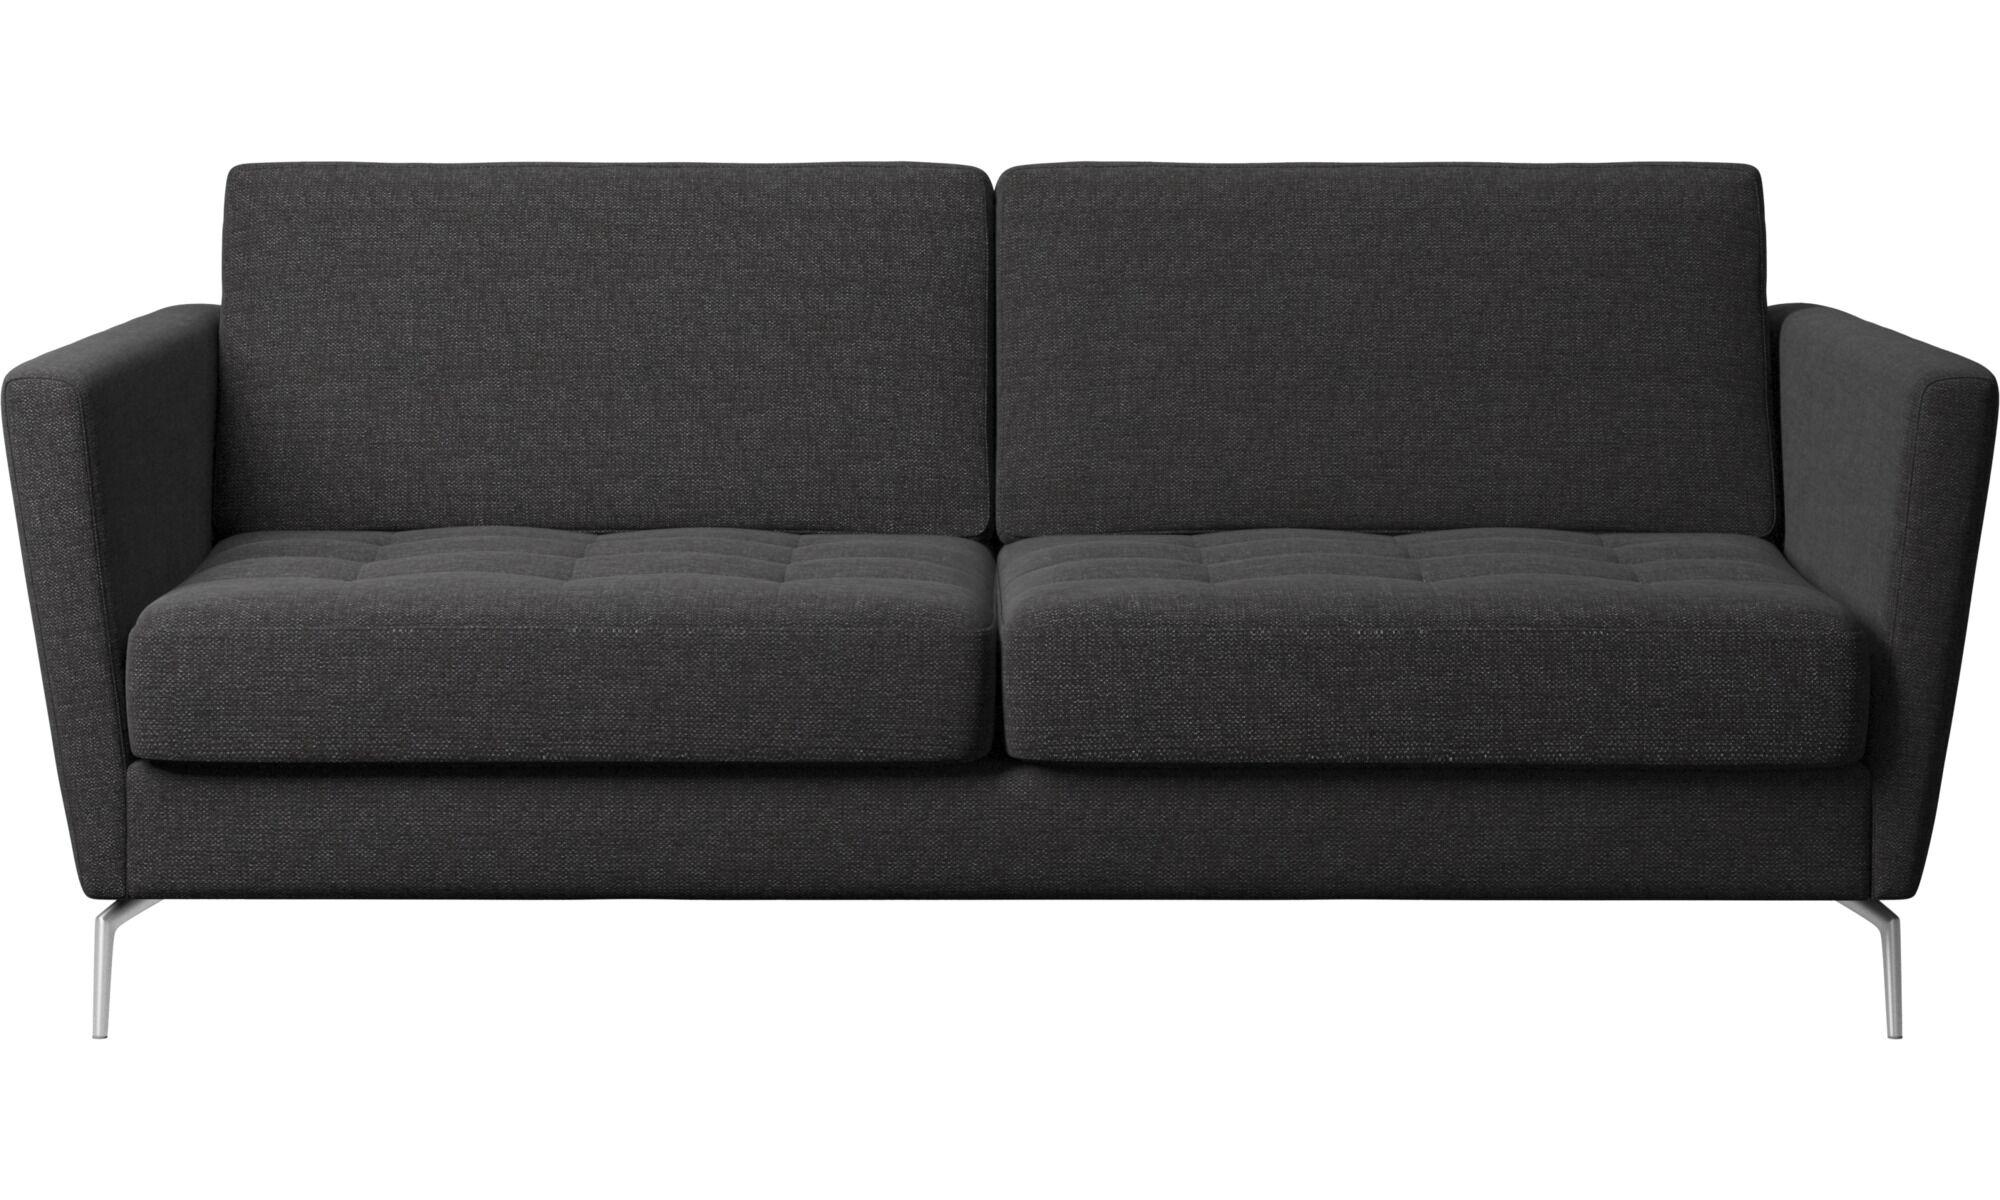 Sofa Beds   Osaka Sofa Bed   Black   Fabric